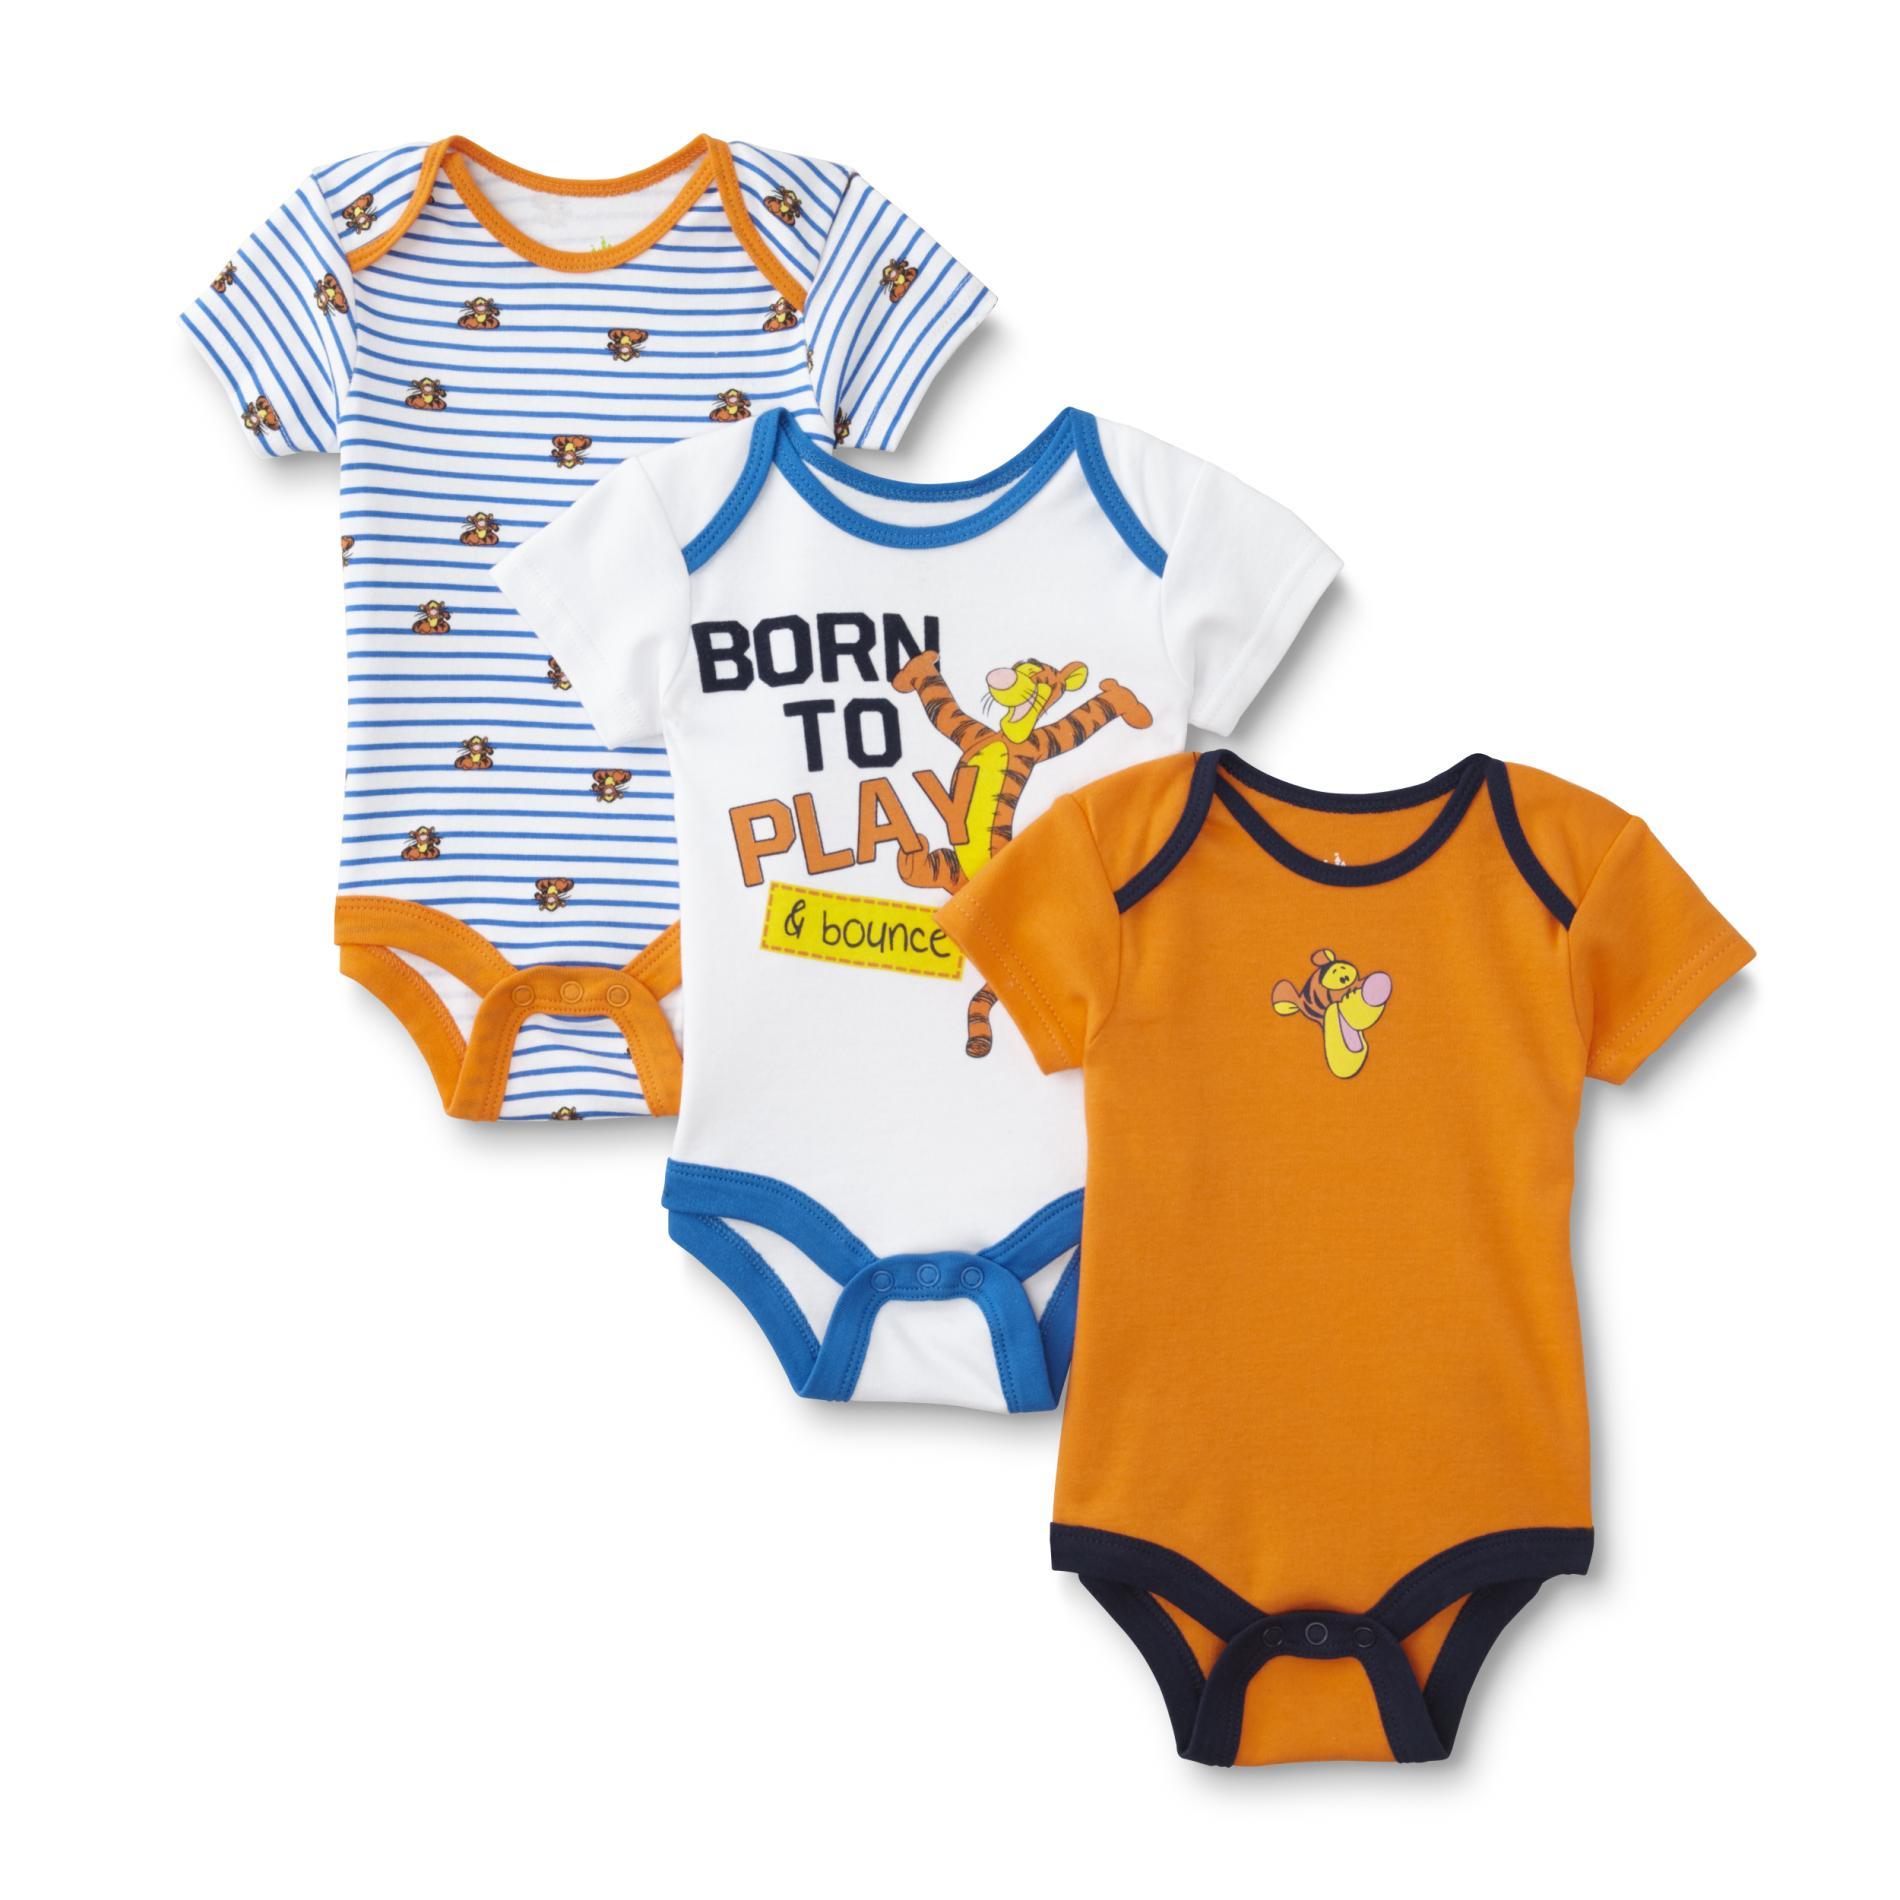 Disney Baby Winnie the Pooh Newborn Boy's 3-Pack Bodysuits - Tigger